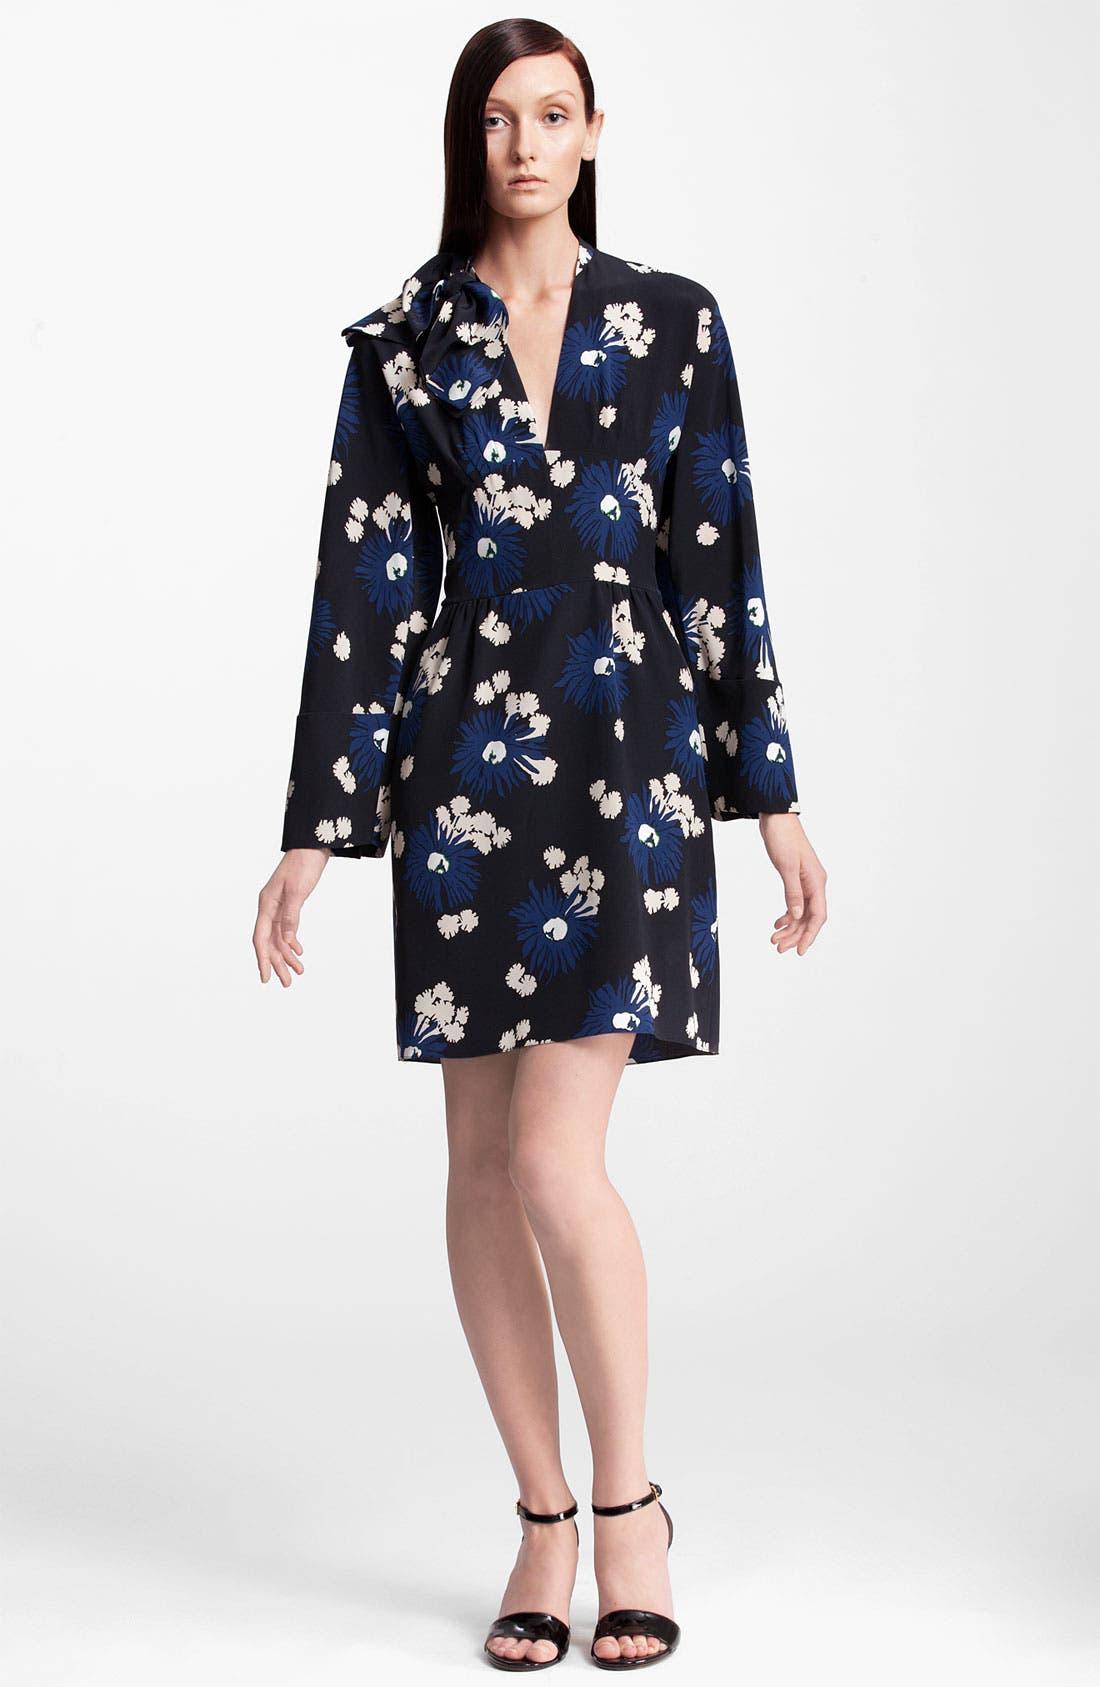 Alternate Image 1 Selected - Marni Floral Print Silk Dress